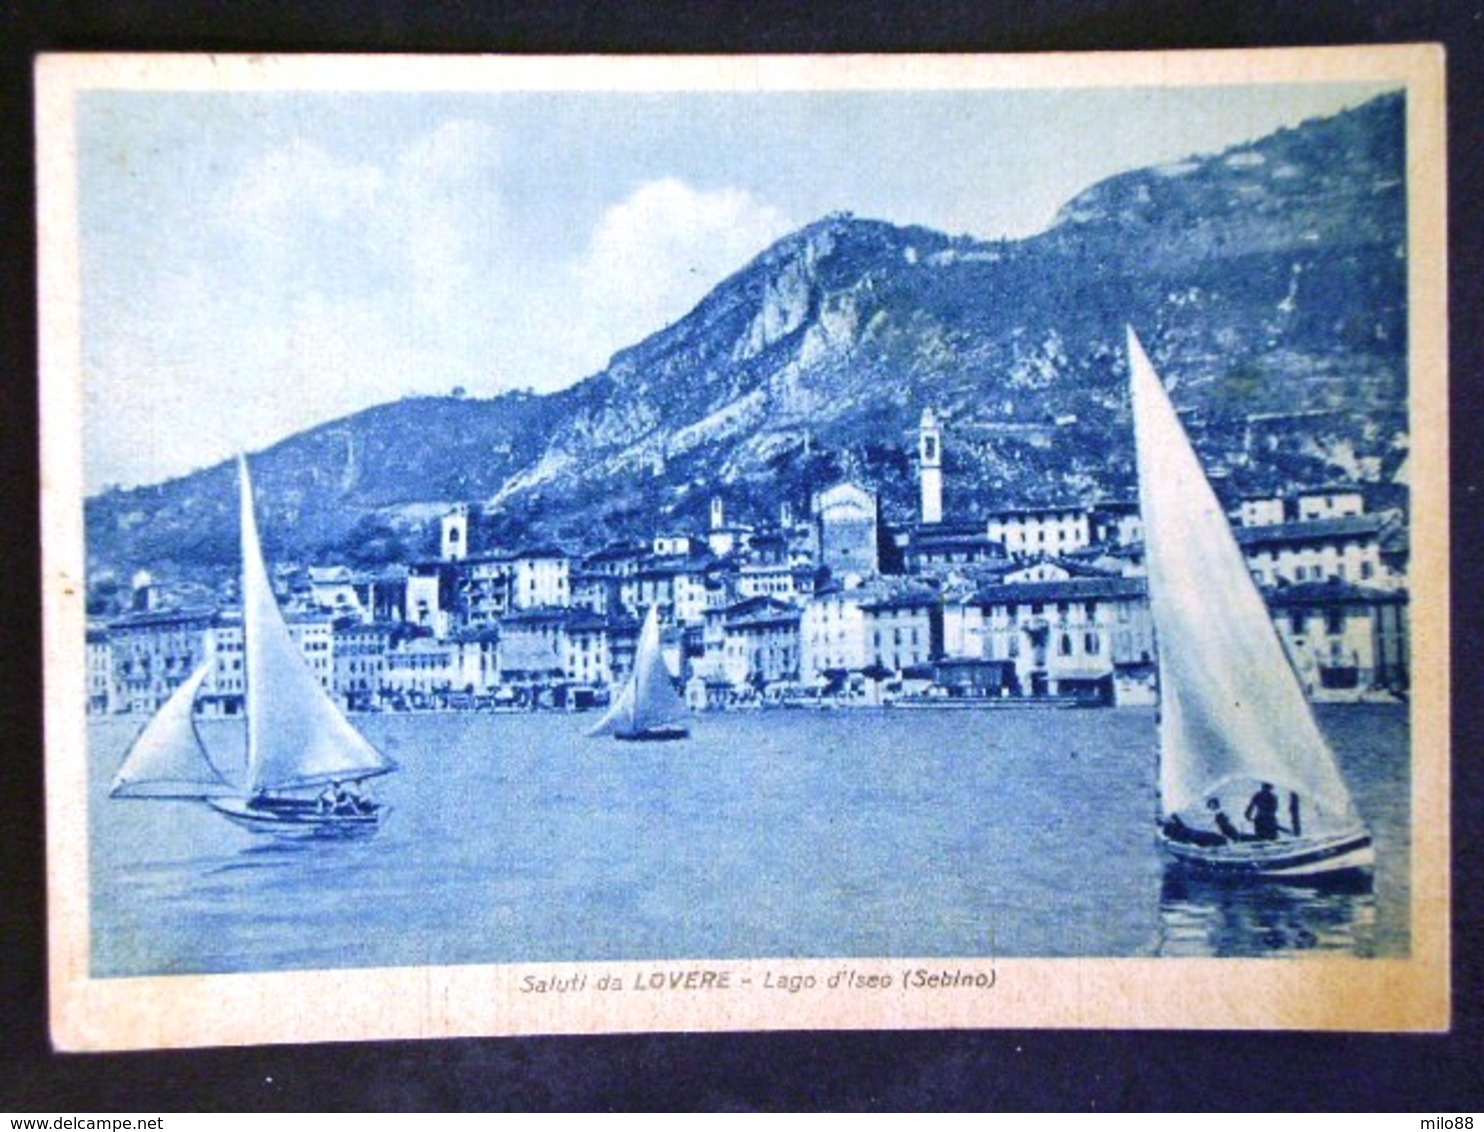 LOMBARDIA -BERGAMO -LOVERE ISEO -F.G. LOTTO N°199 - Bergamo